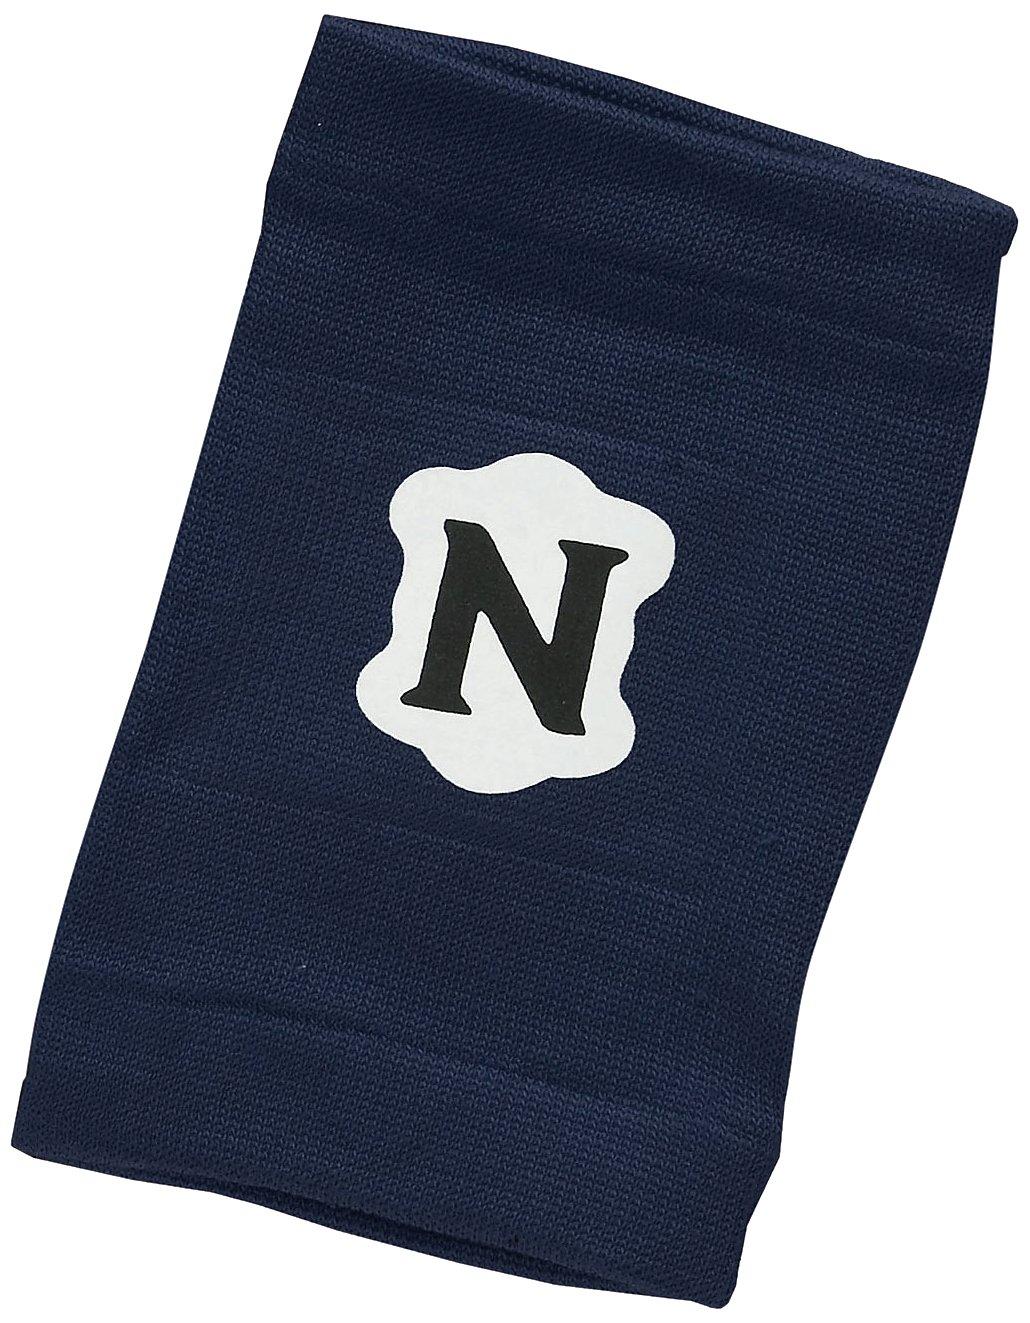 Adams Neumann Wrist Coach (3-Inch x 5, Navy)